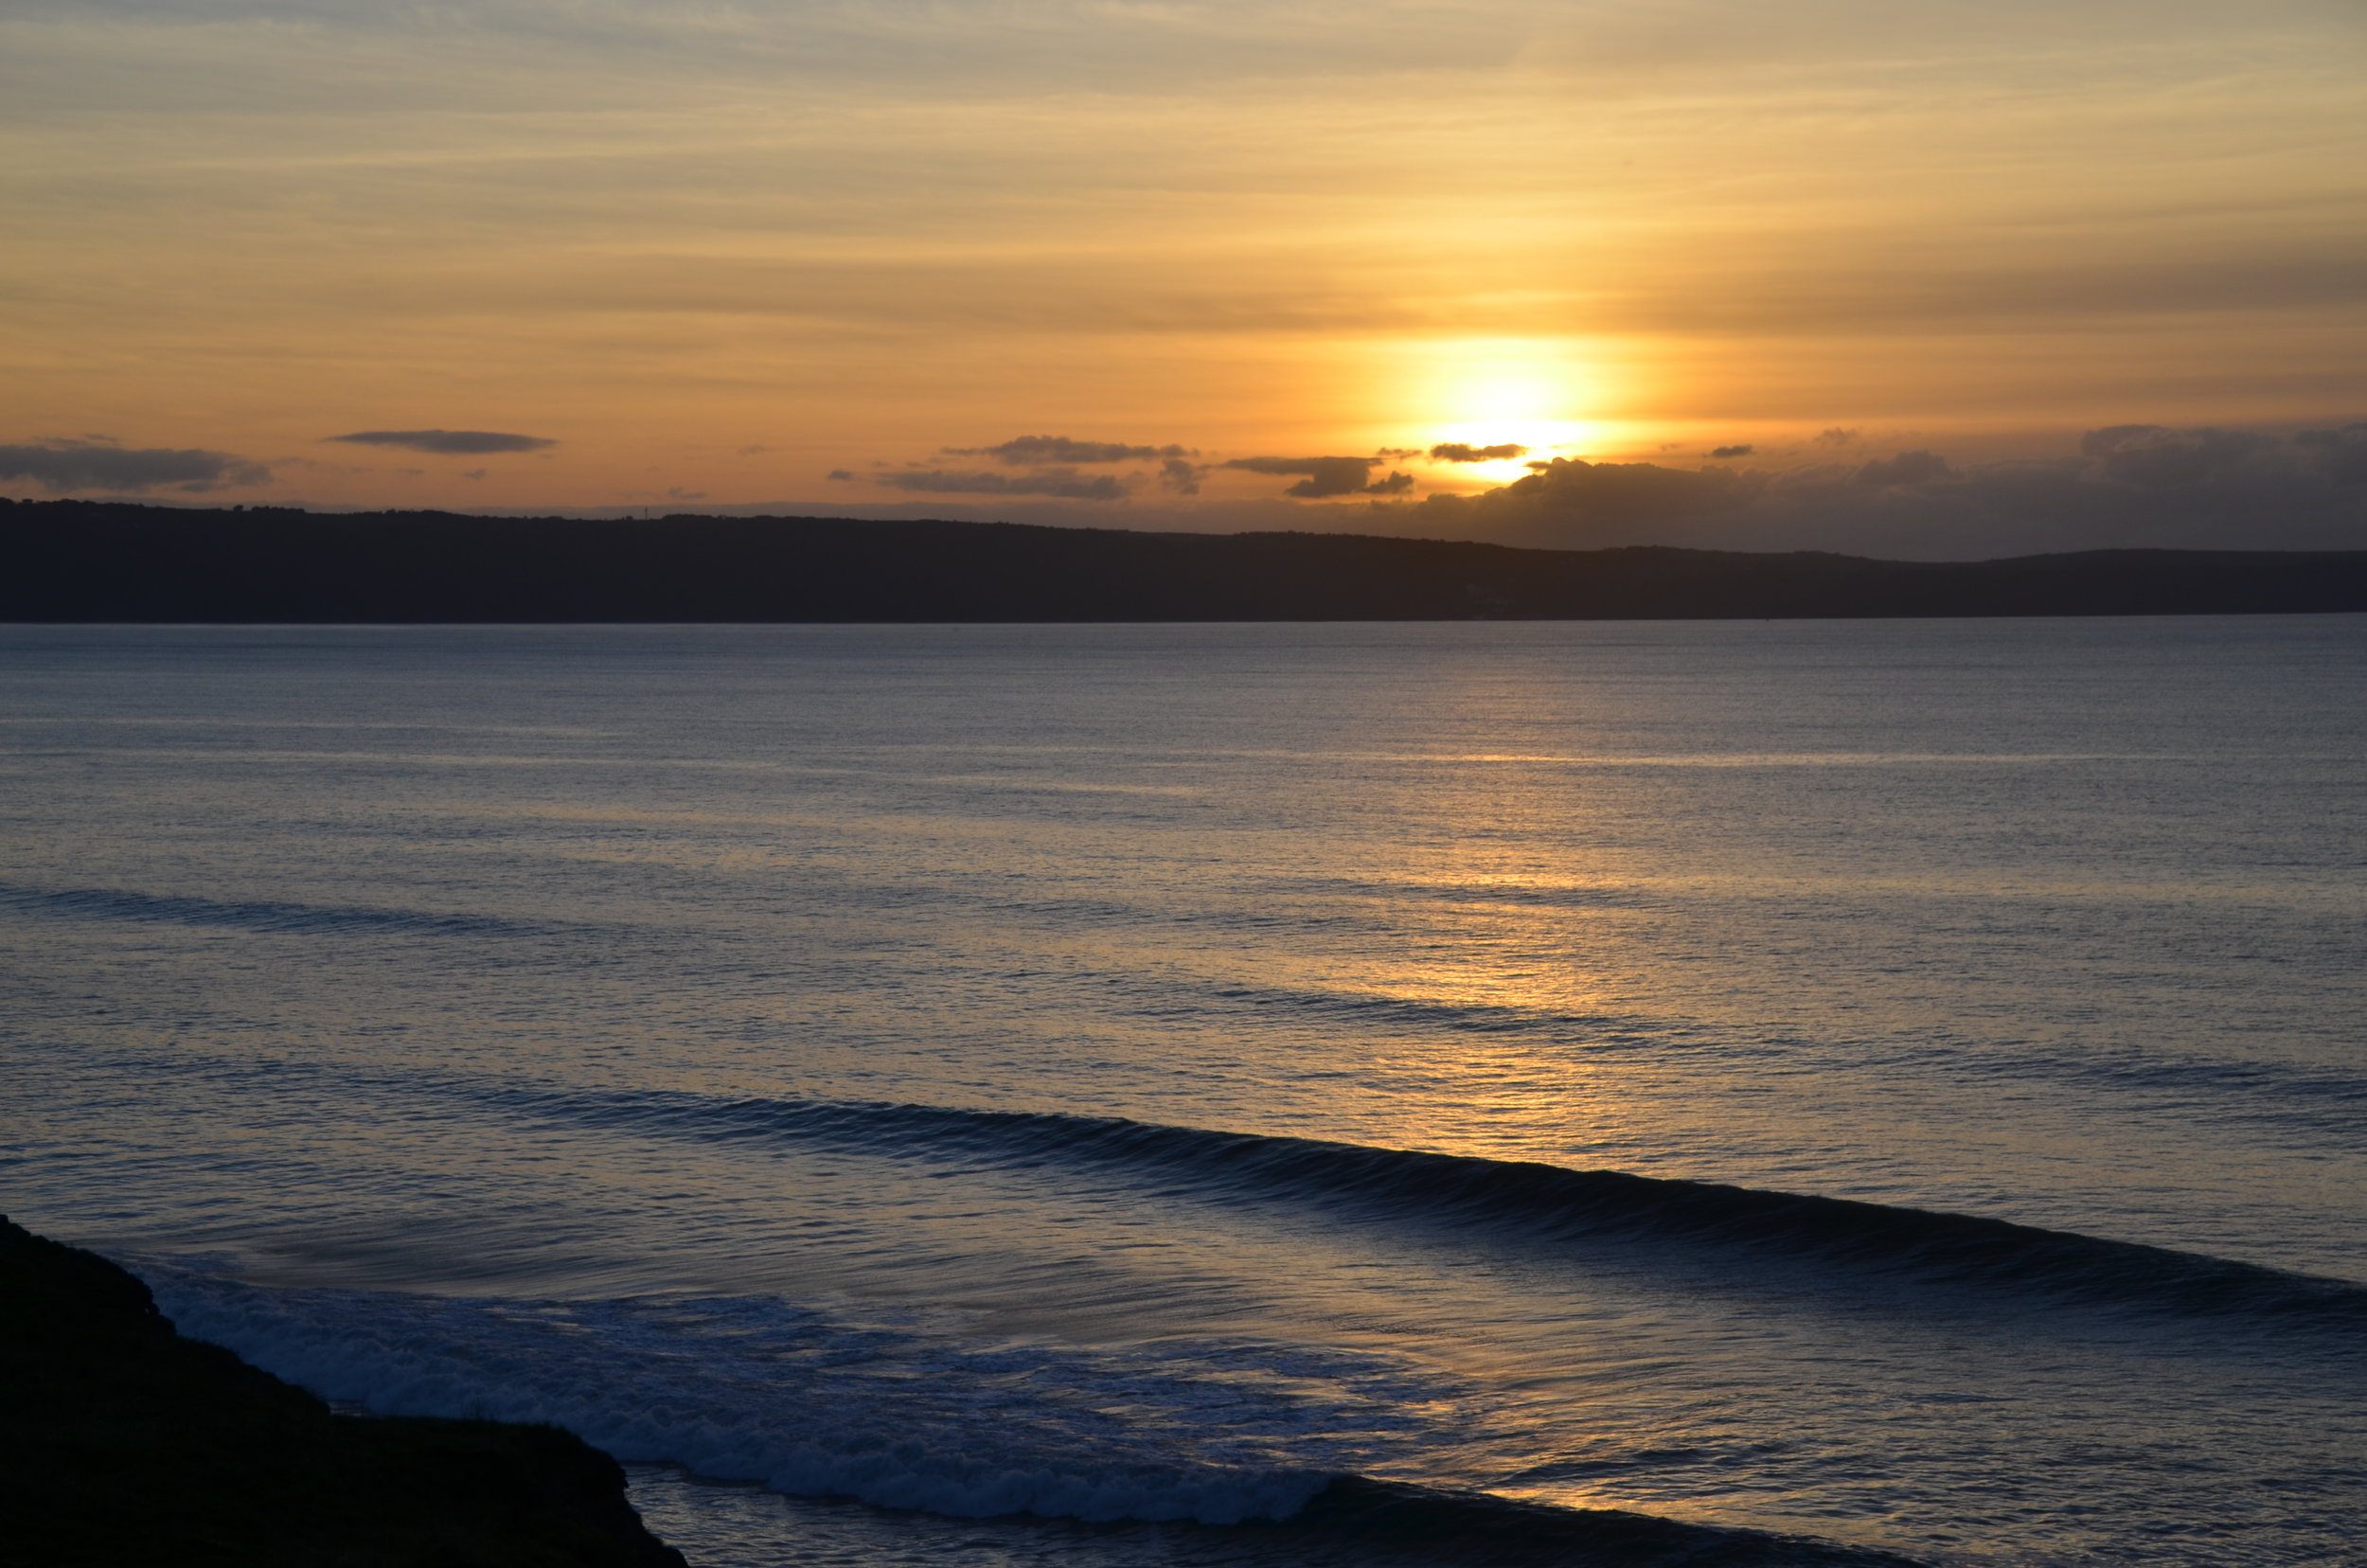 Sunset surfing at Westward Ho!